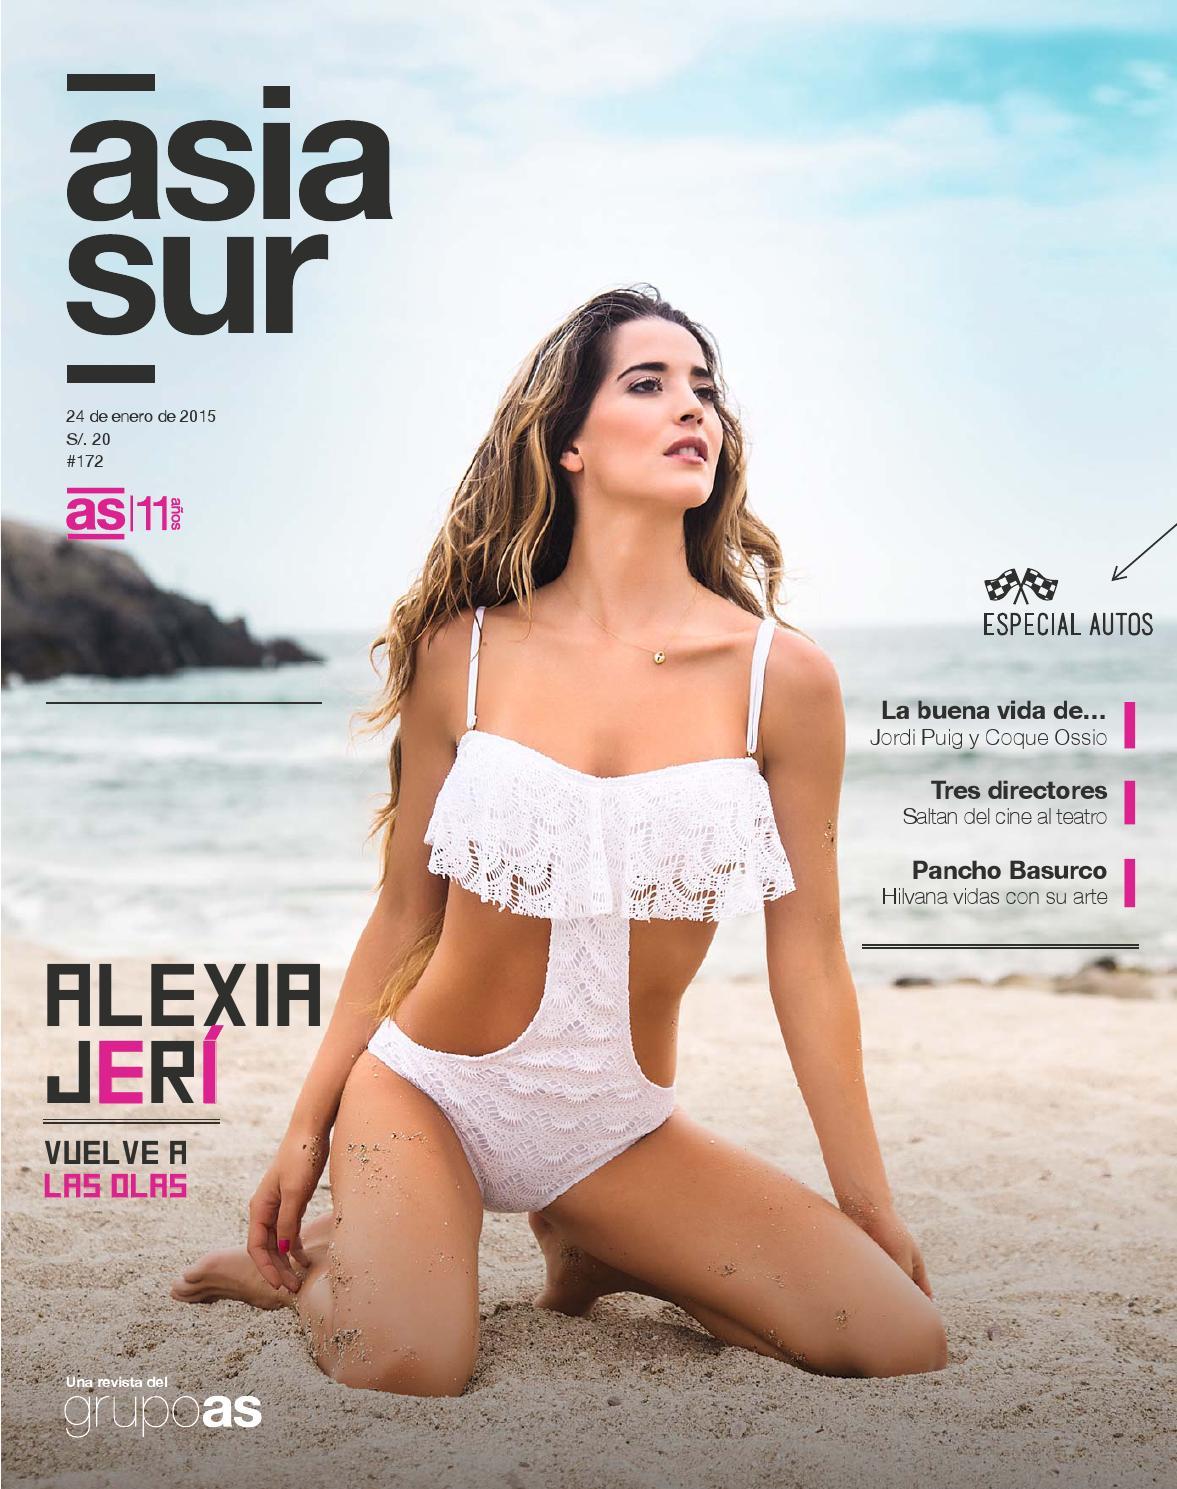 Revista nupcial del sur de Asia